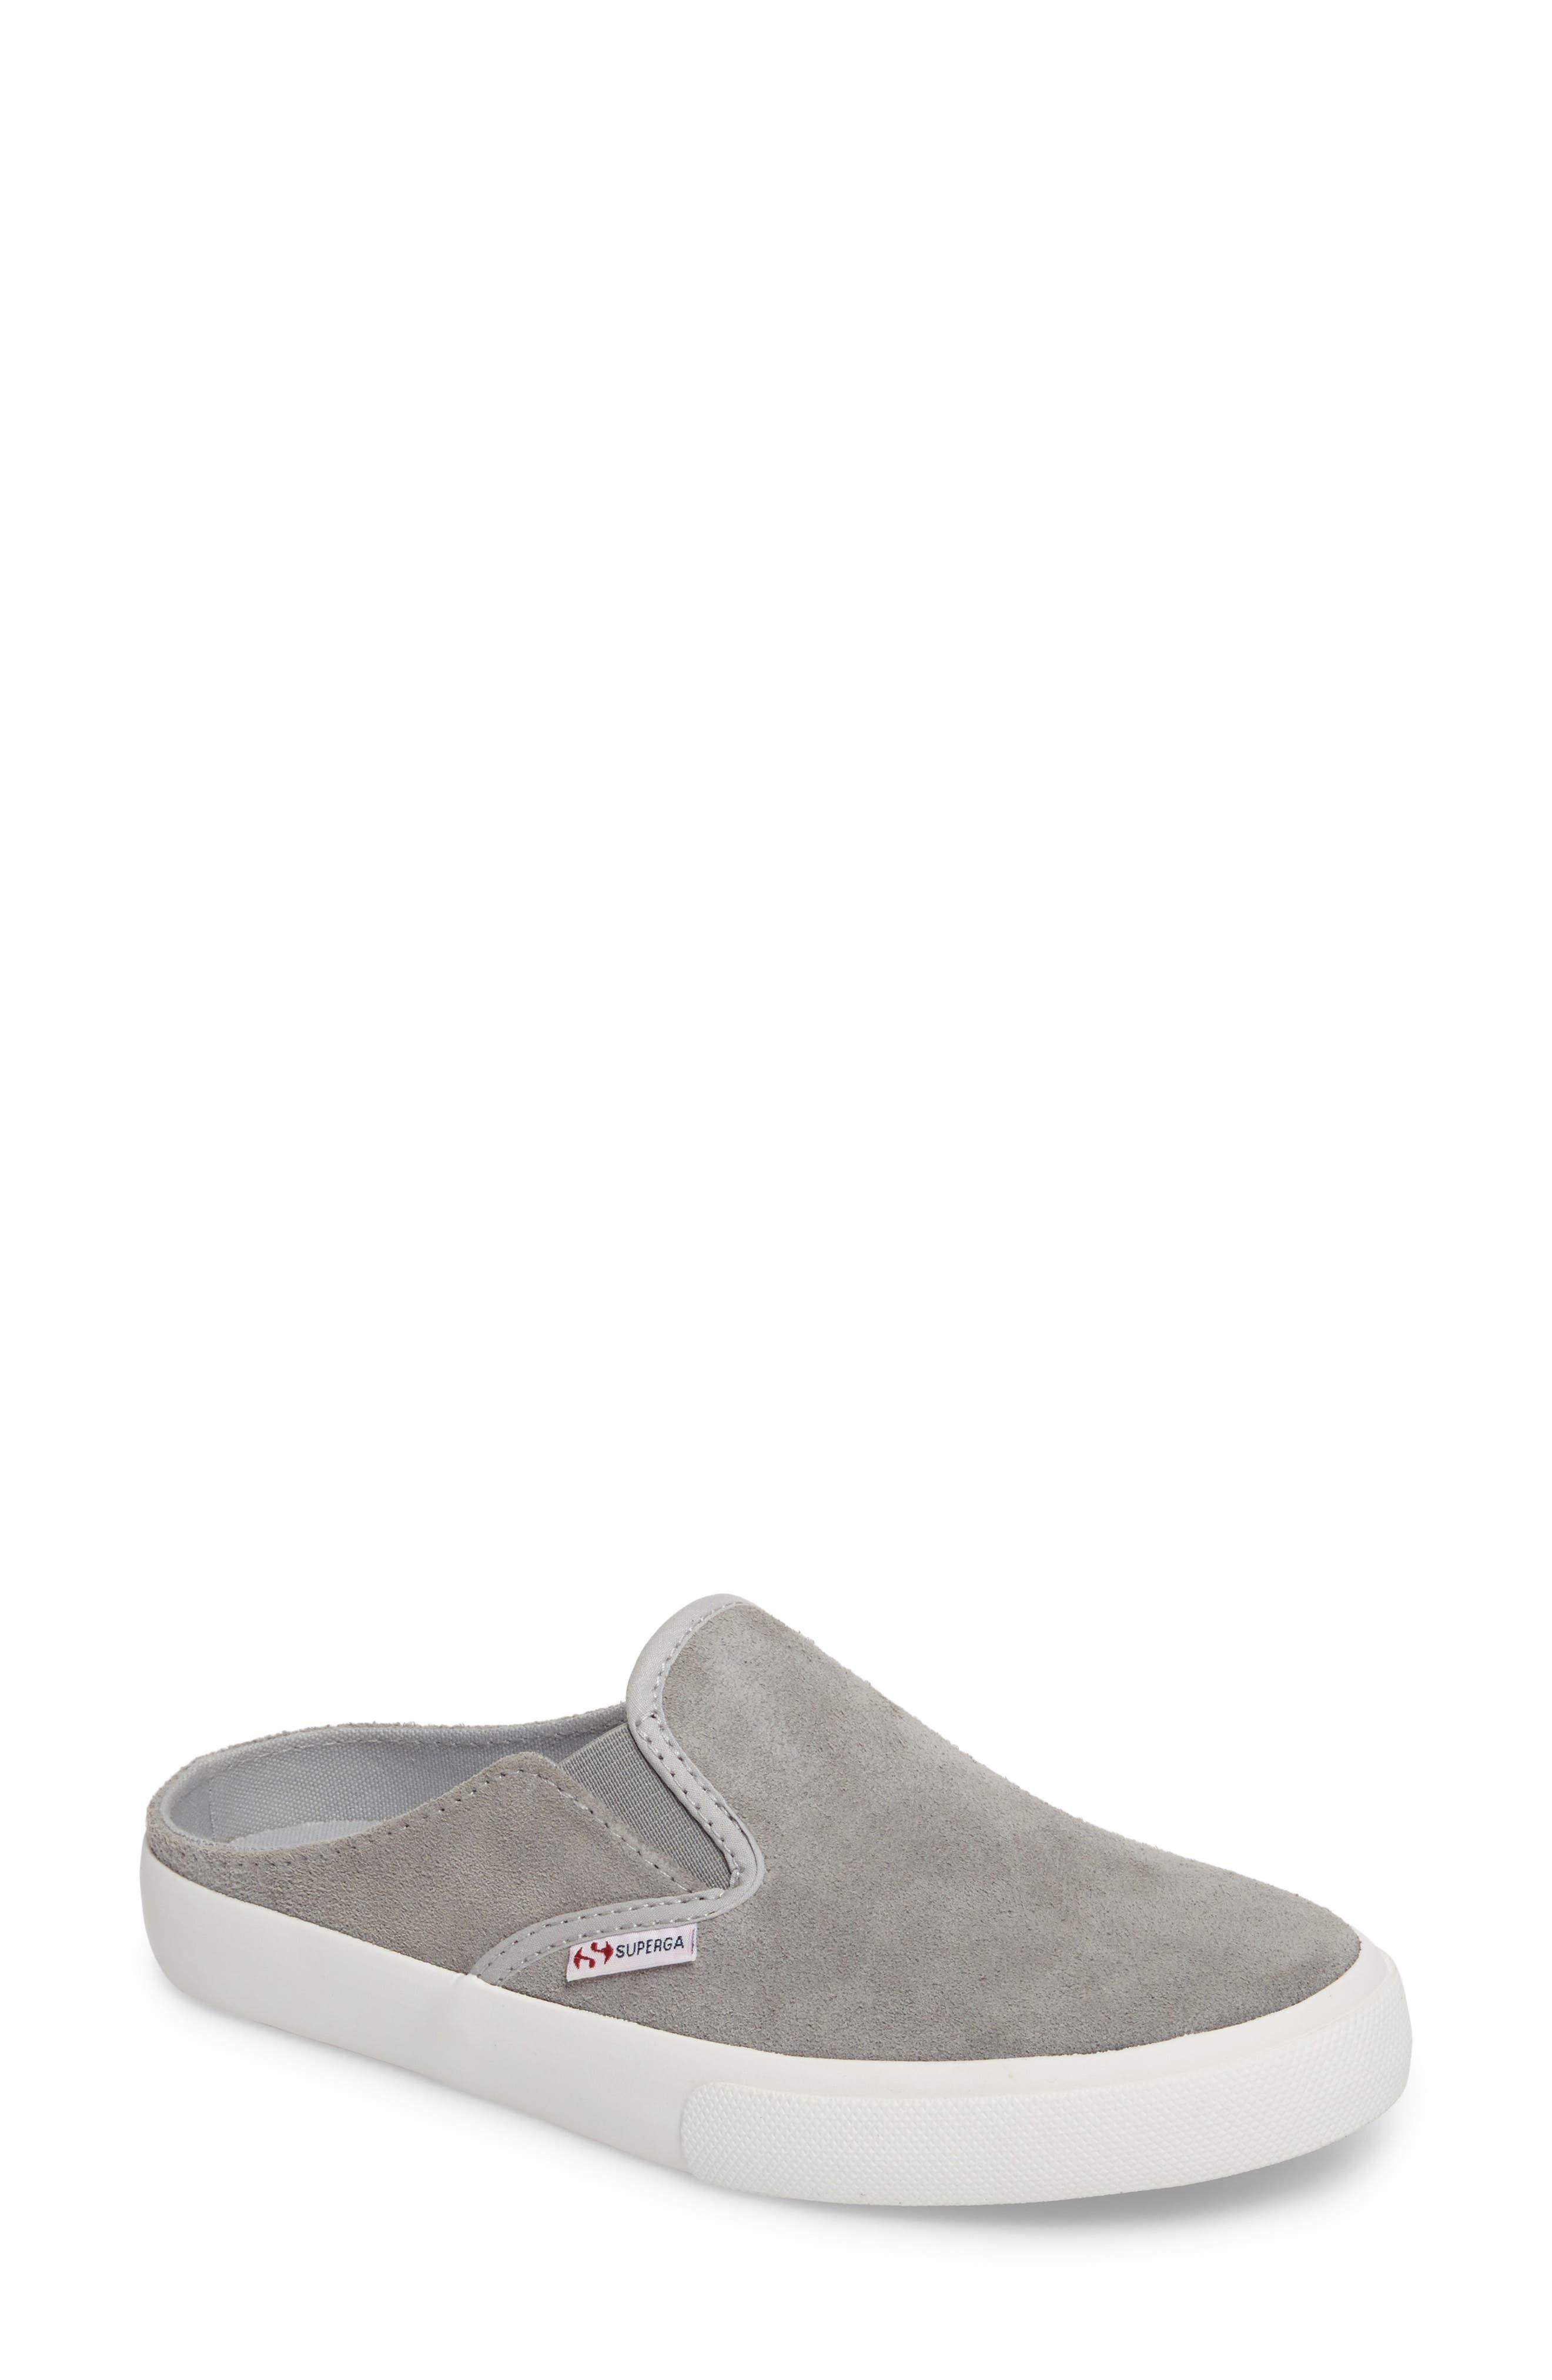 Slip-On Mule Sneaker,                         Main,                         color, 020